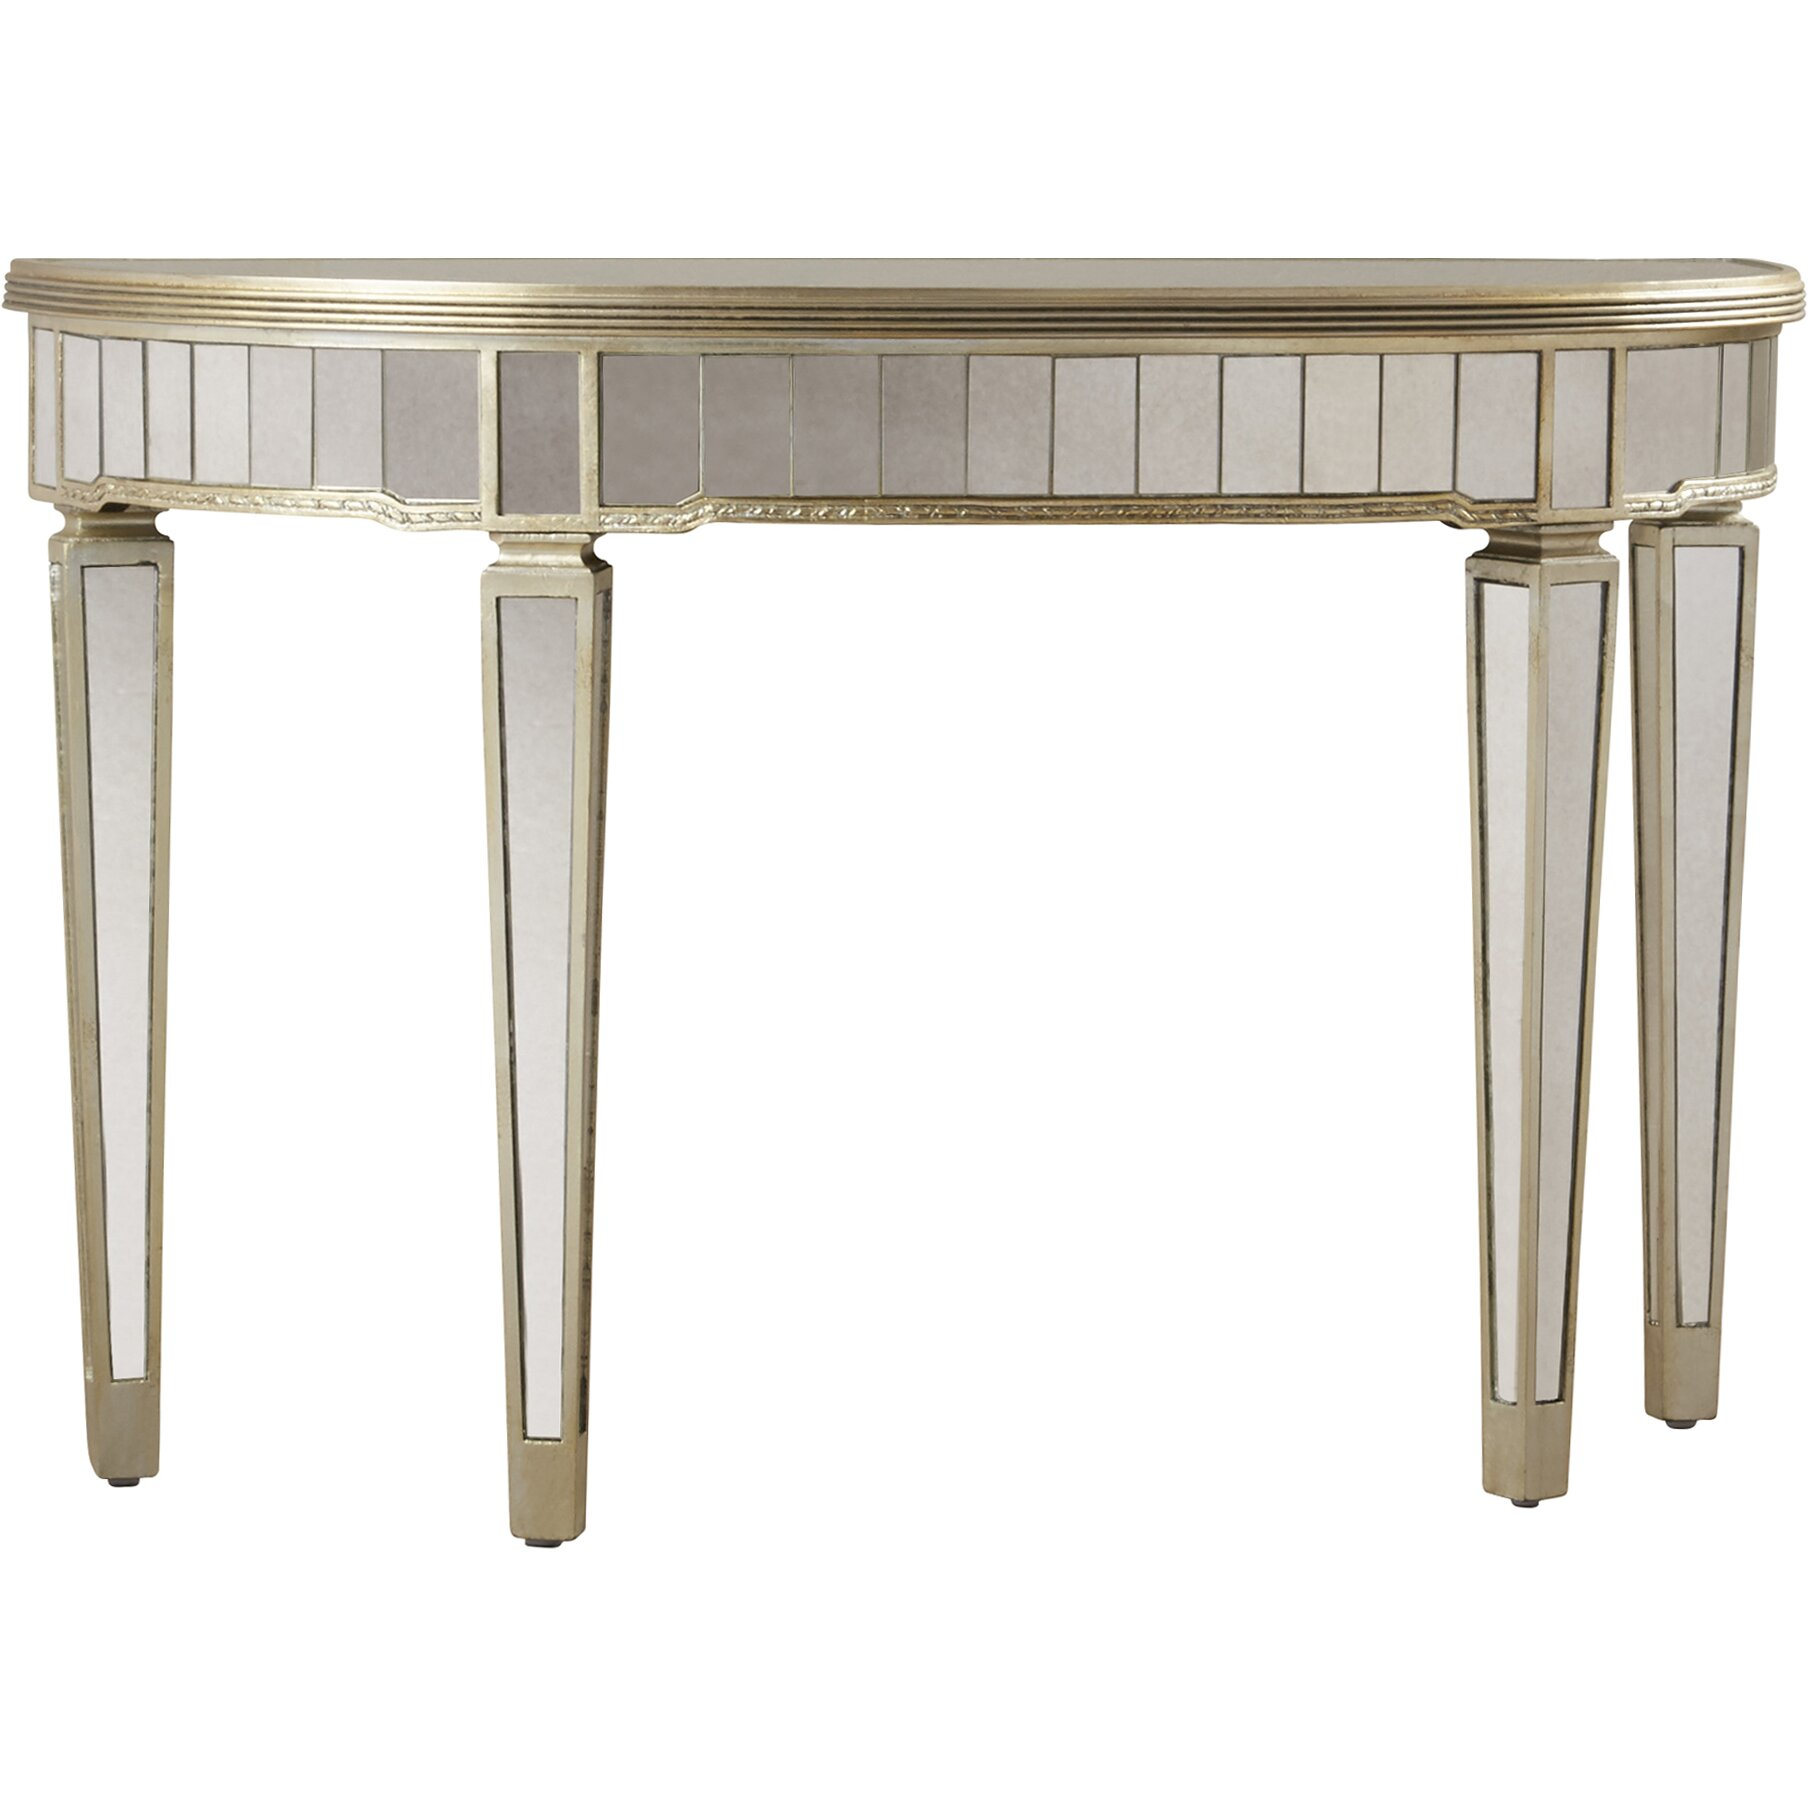 Mirrored Console Table: Sandbach Mirrored Console Table In Antique Silver